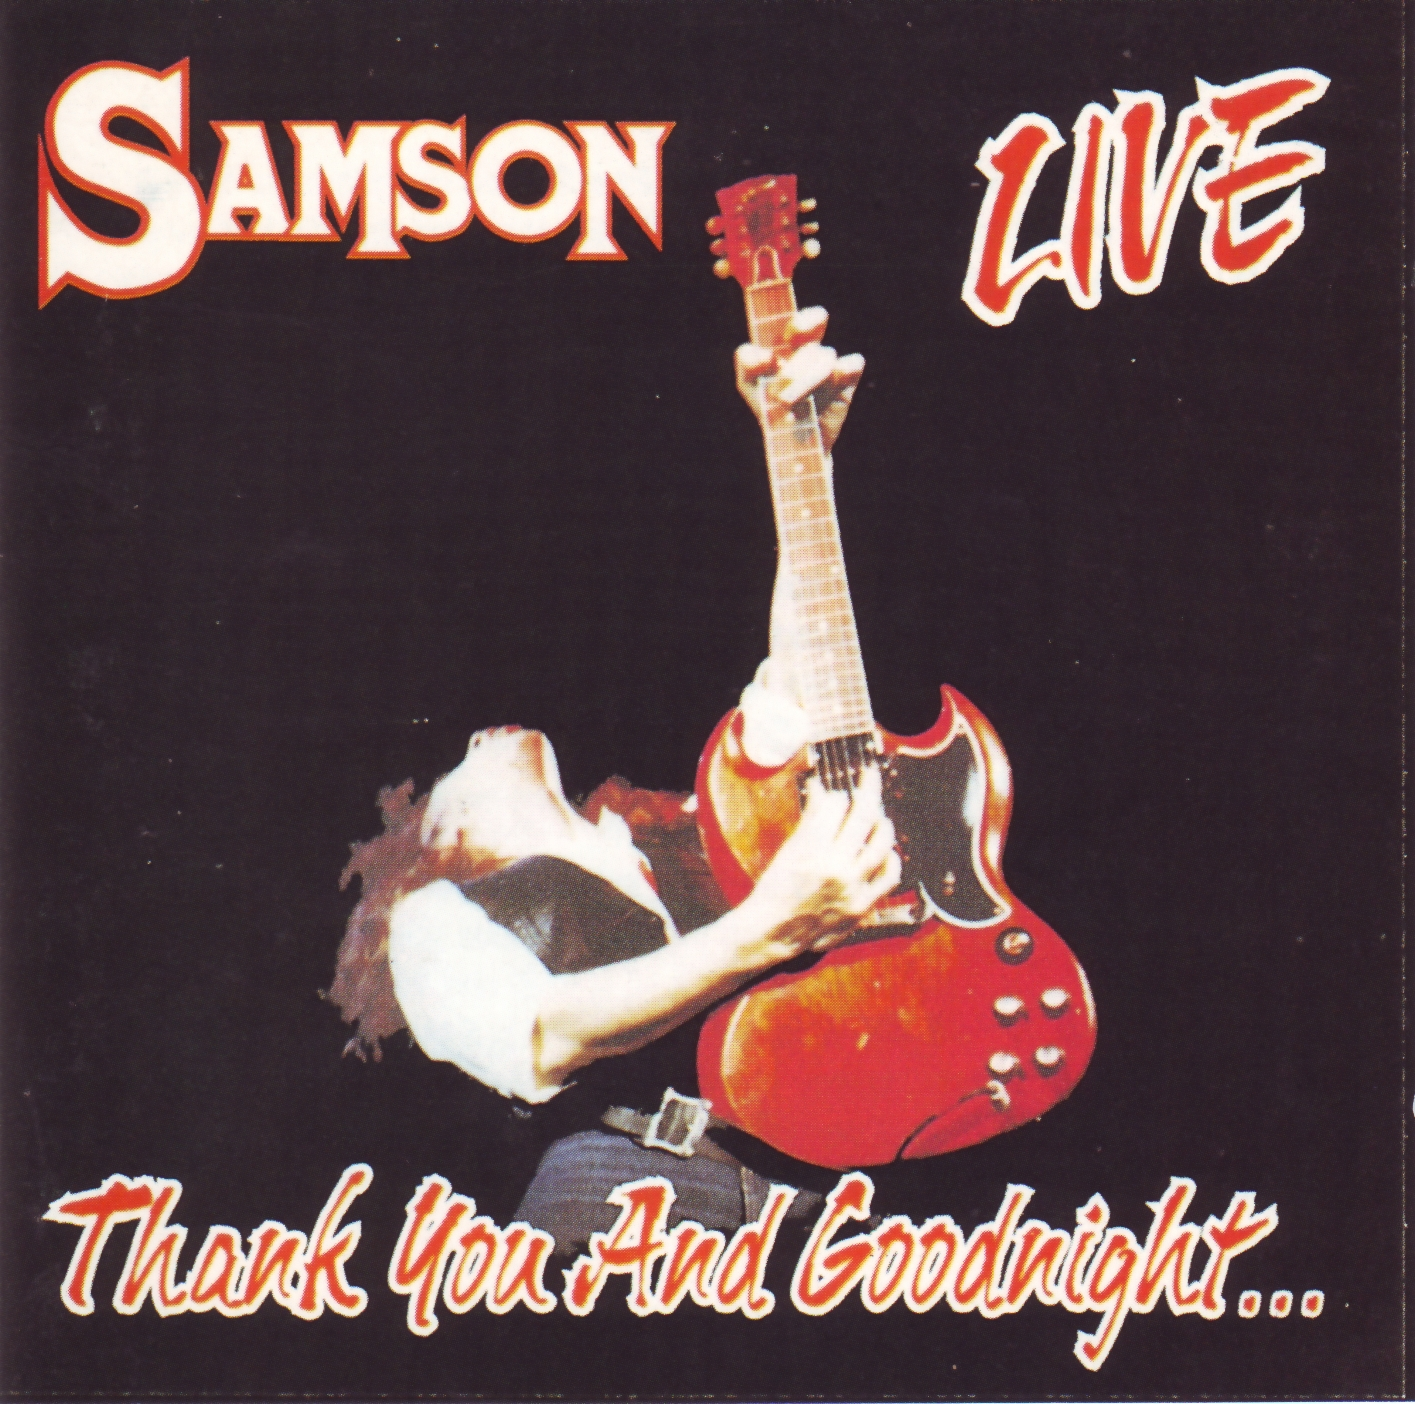 Samson Band